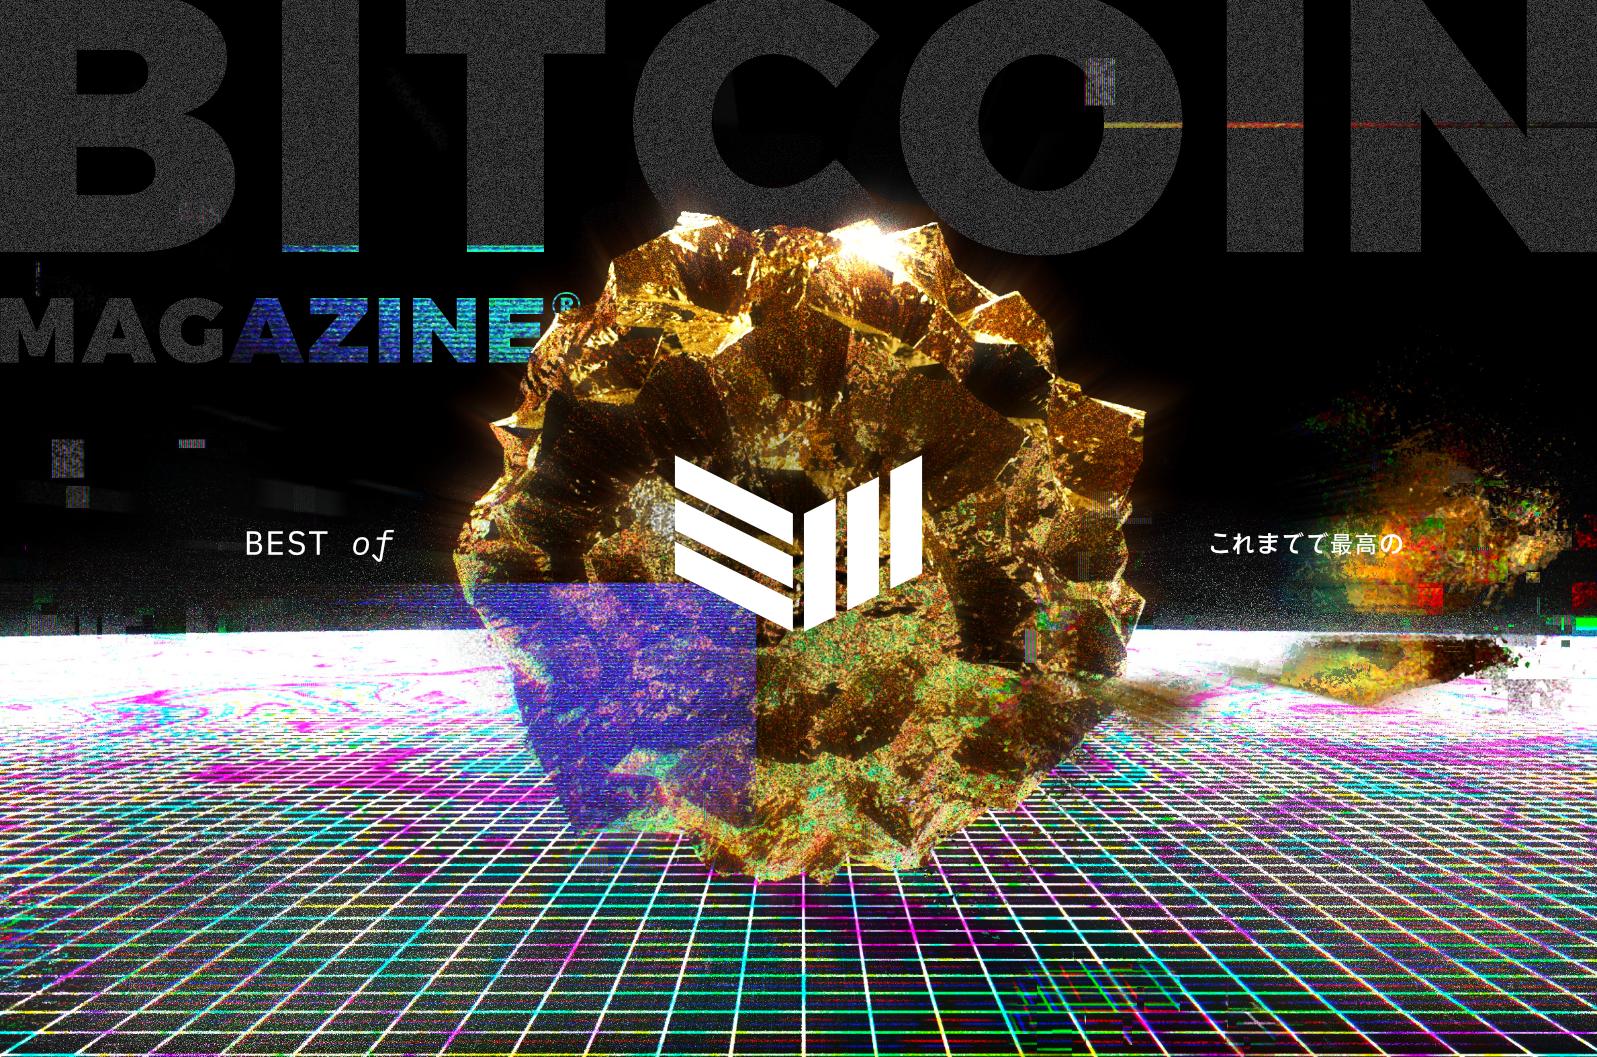 The Best Of Bitcoin Magazine Reader Survey